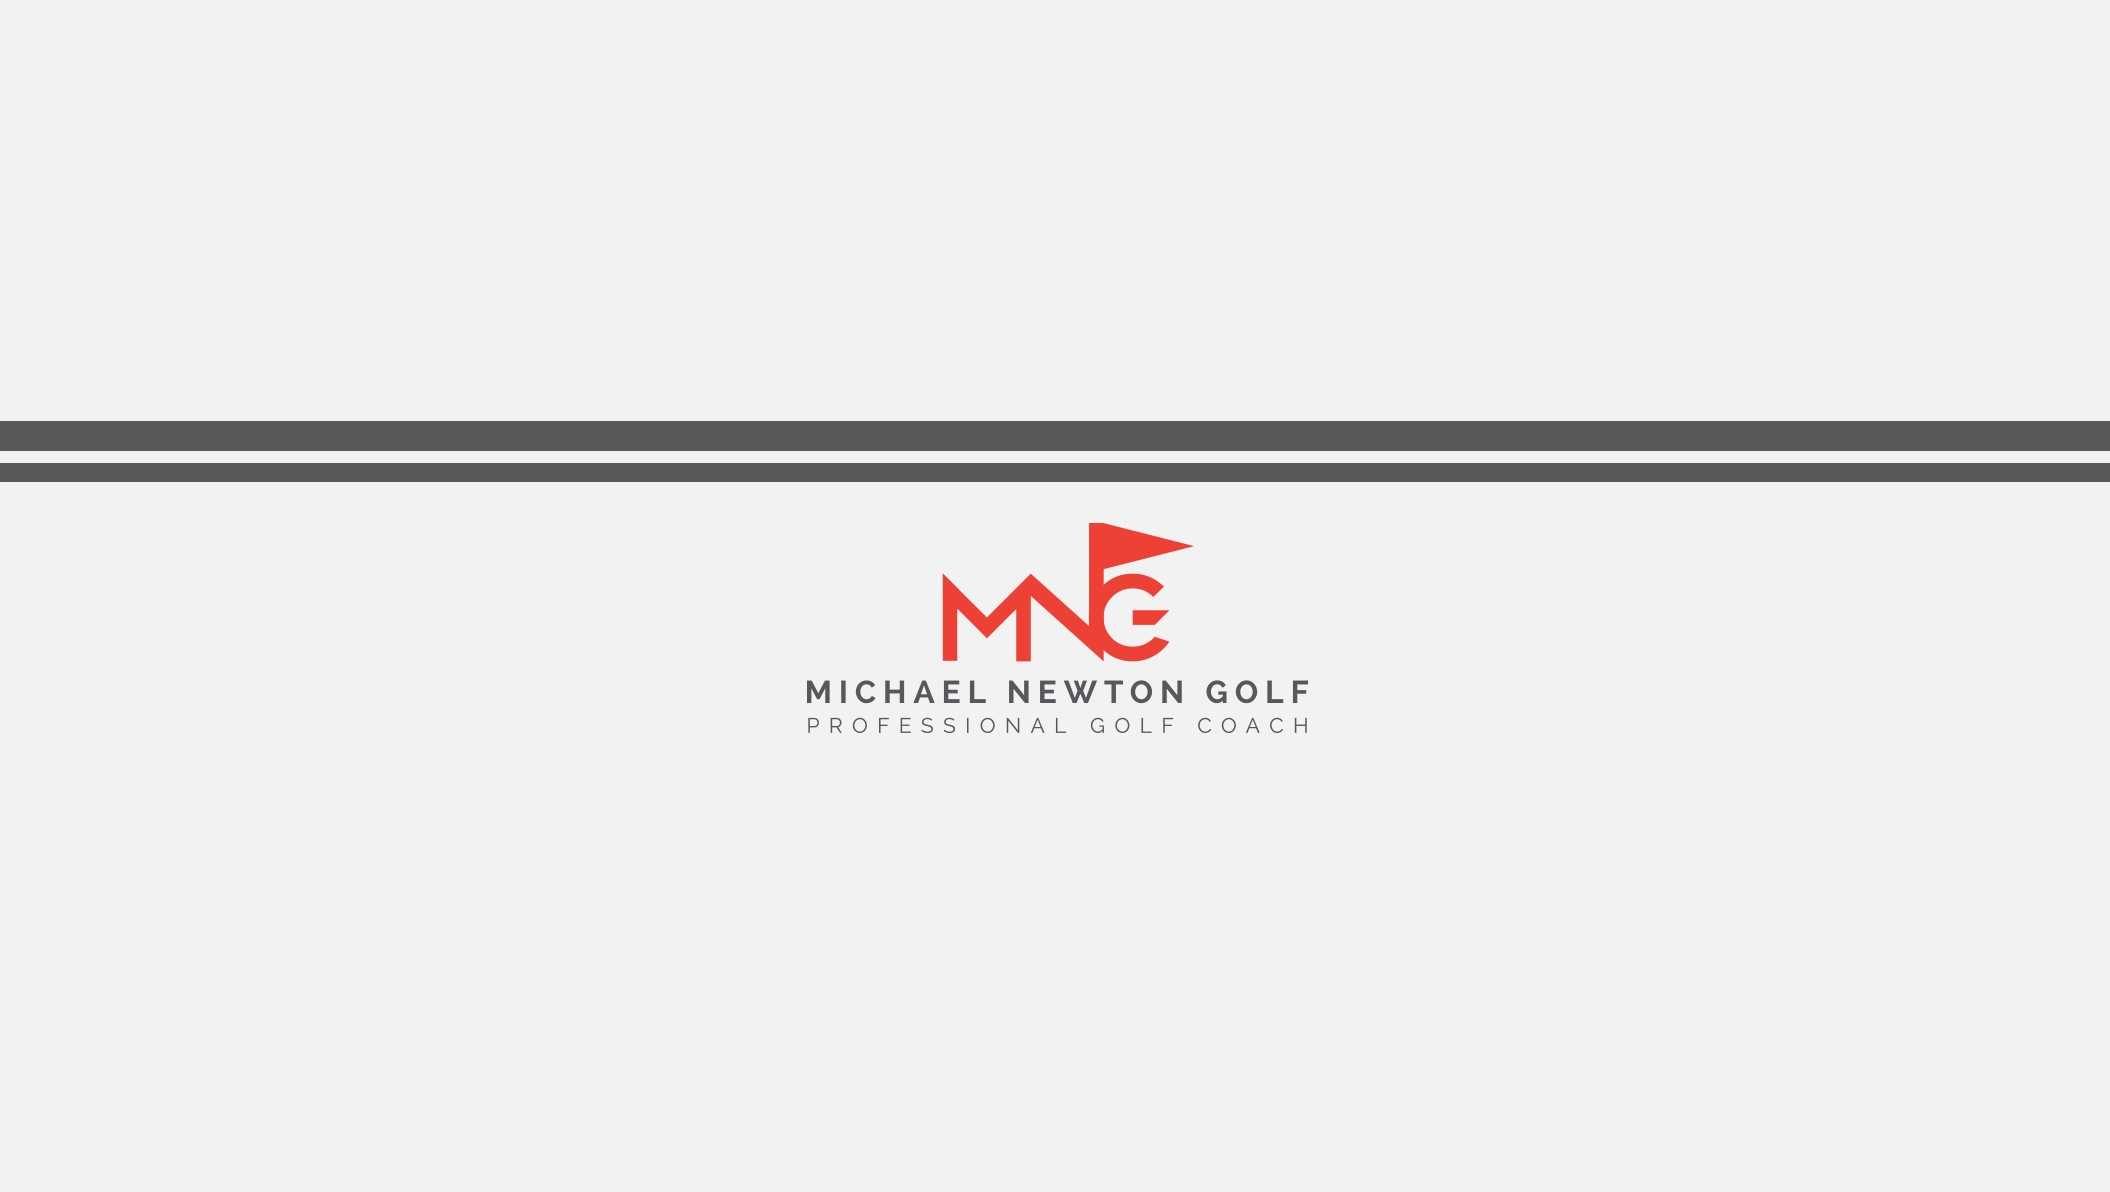 Michael Newton Golf